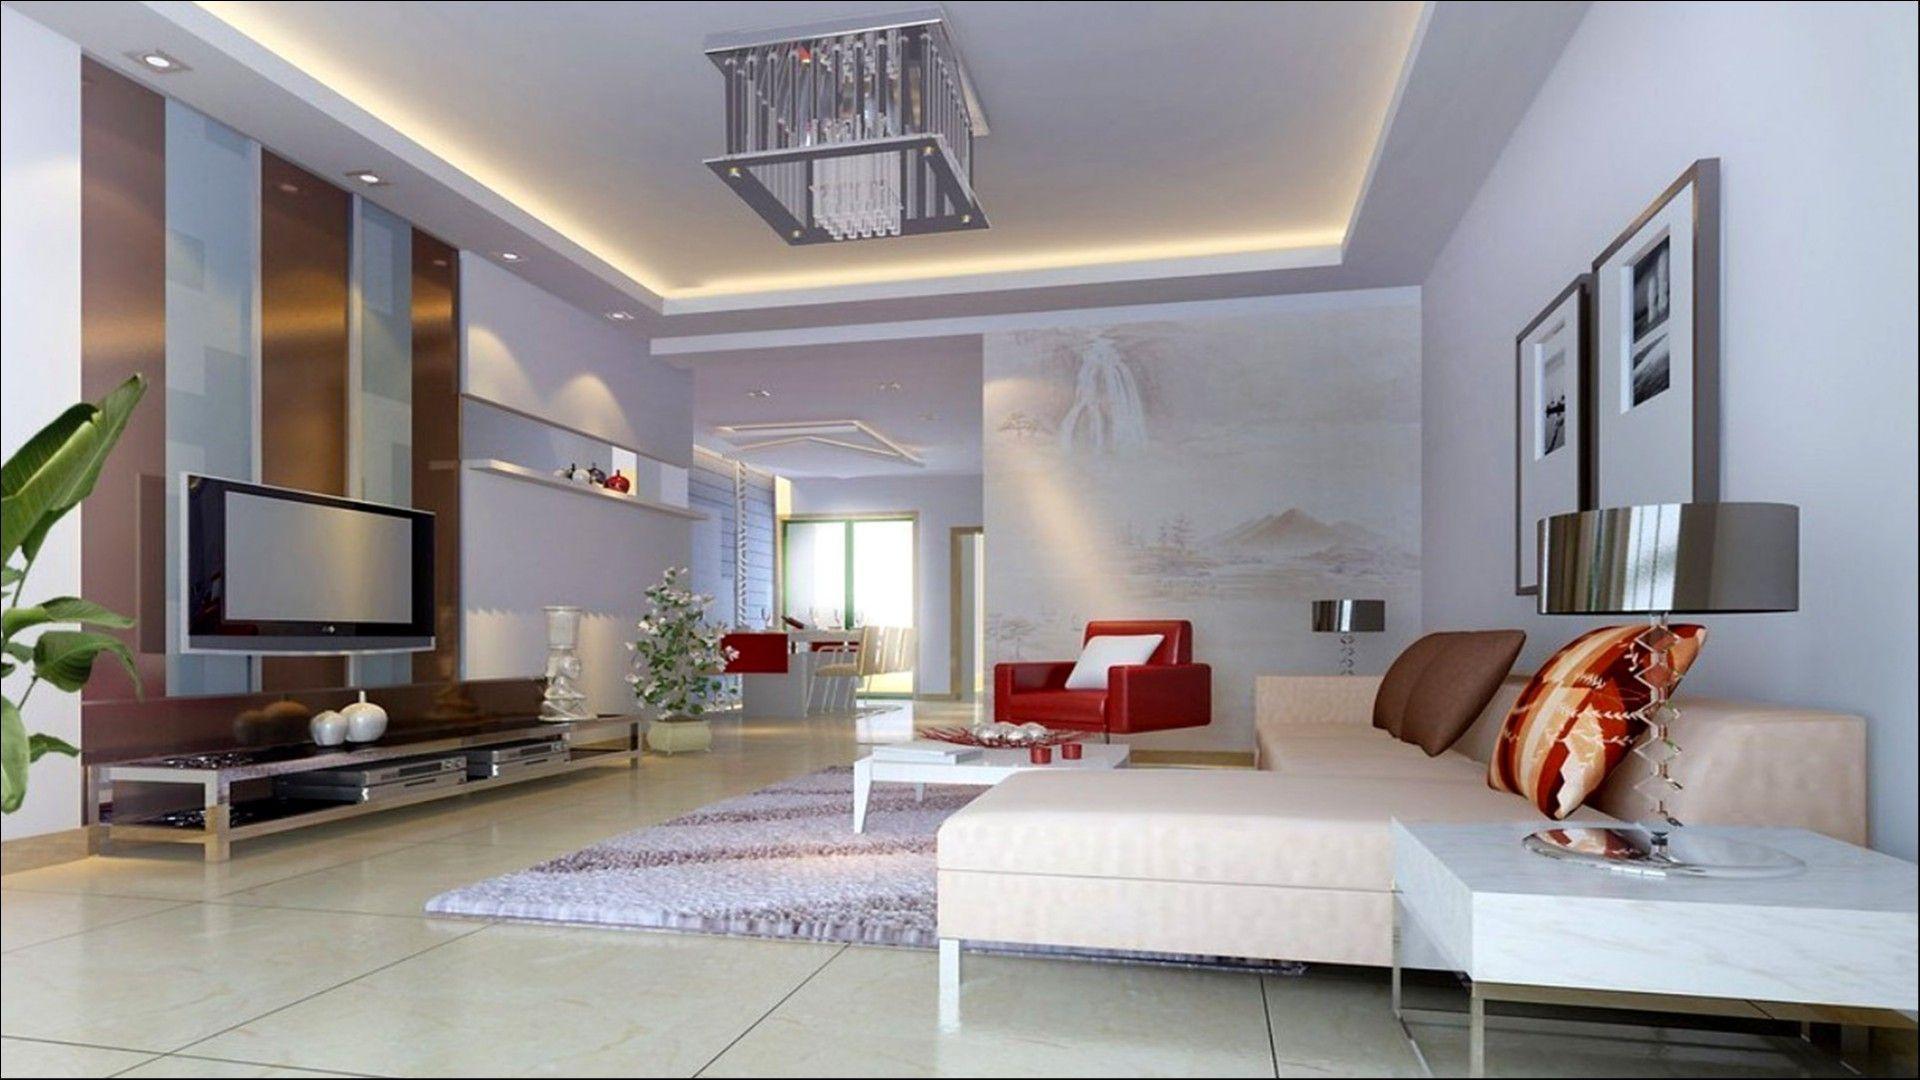 Living Room Images Free Download Lovely Living Room Wallpaper Free